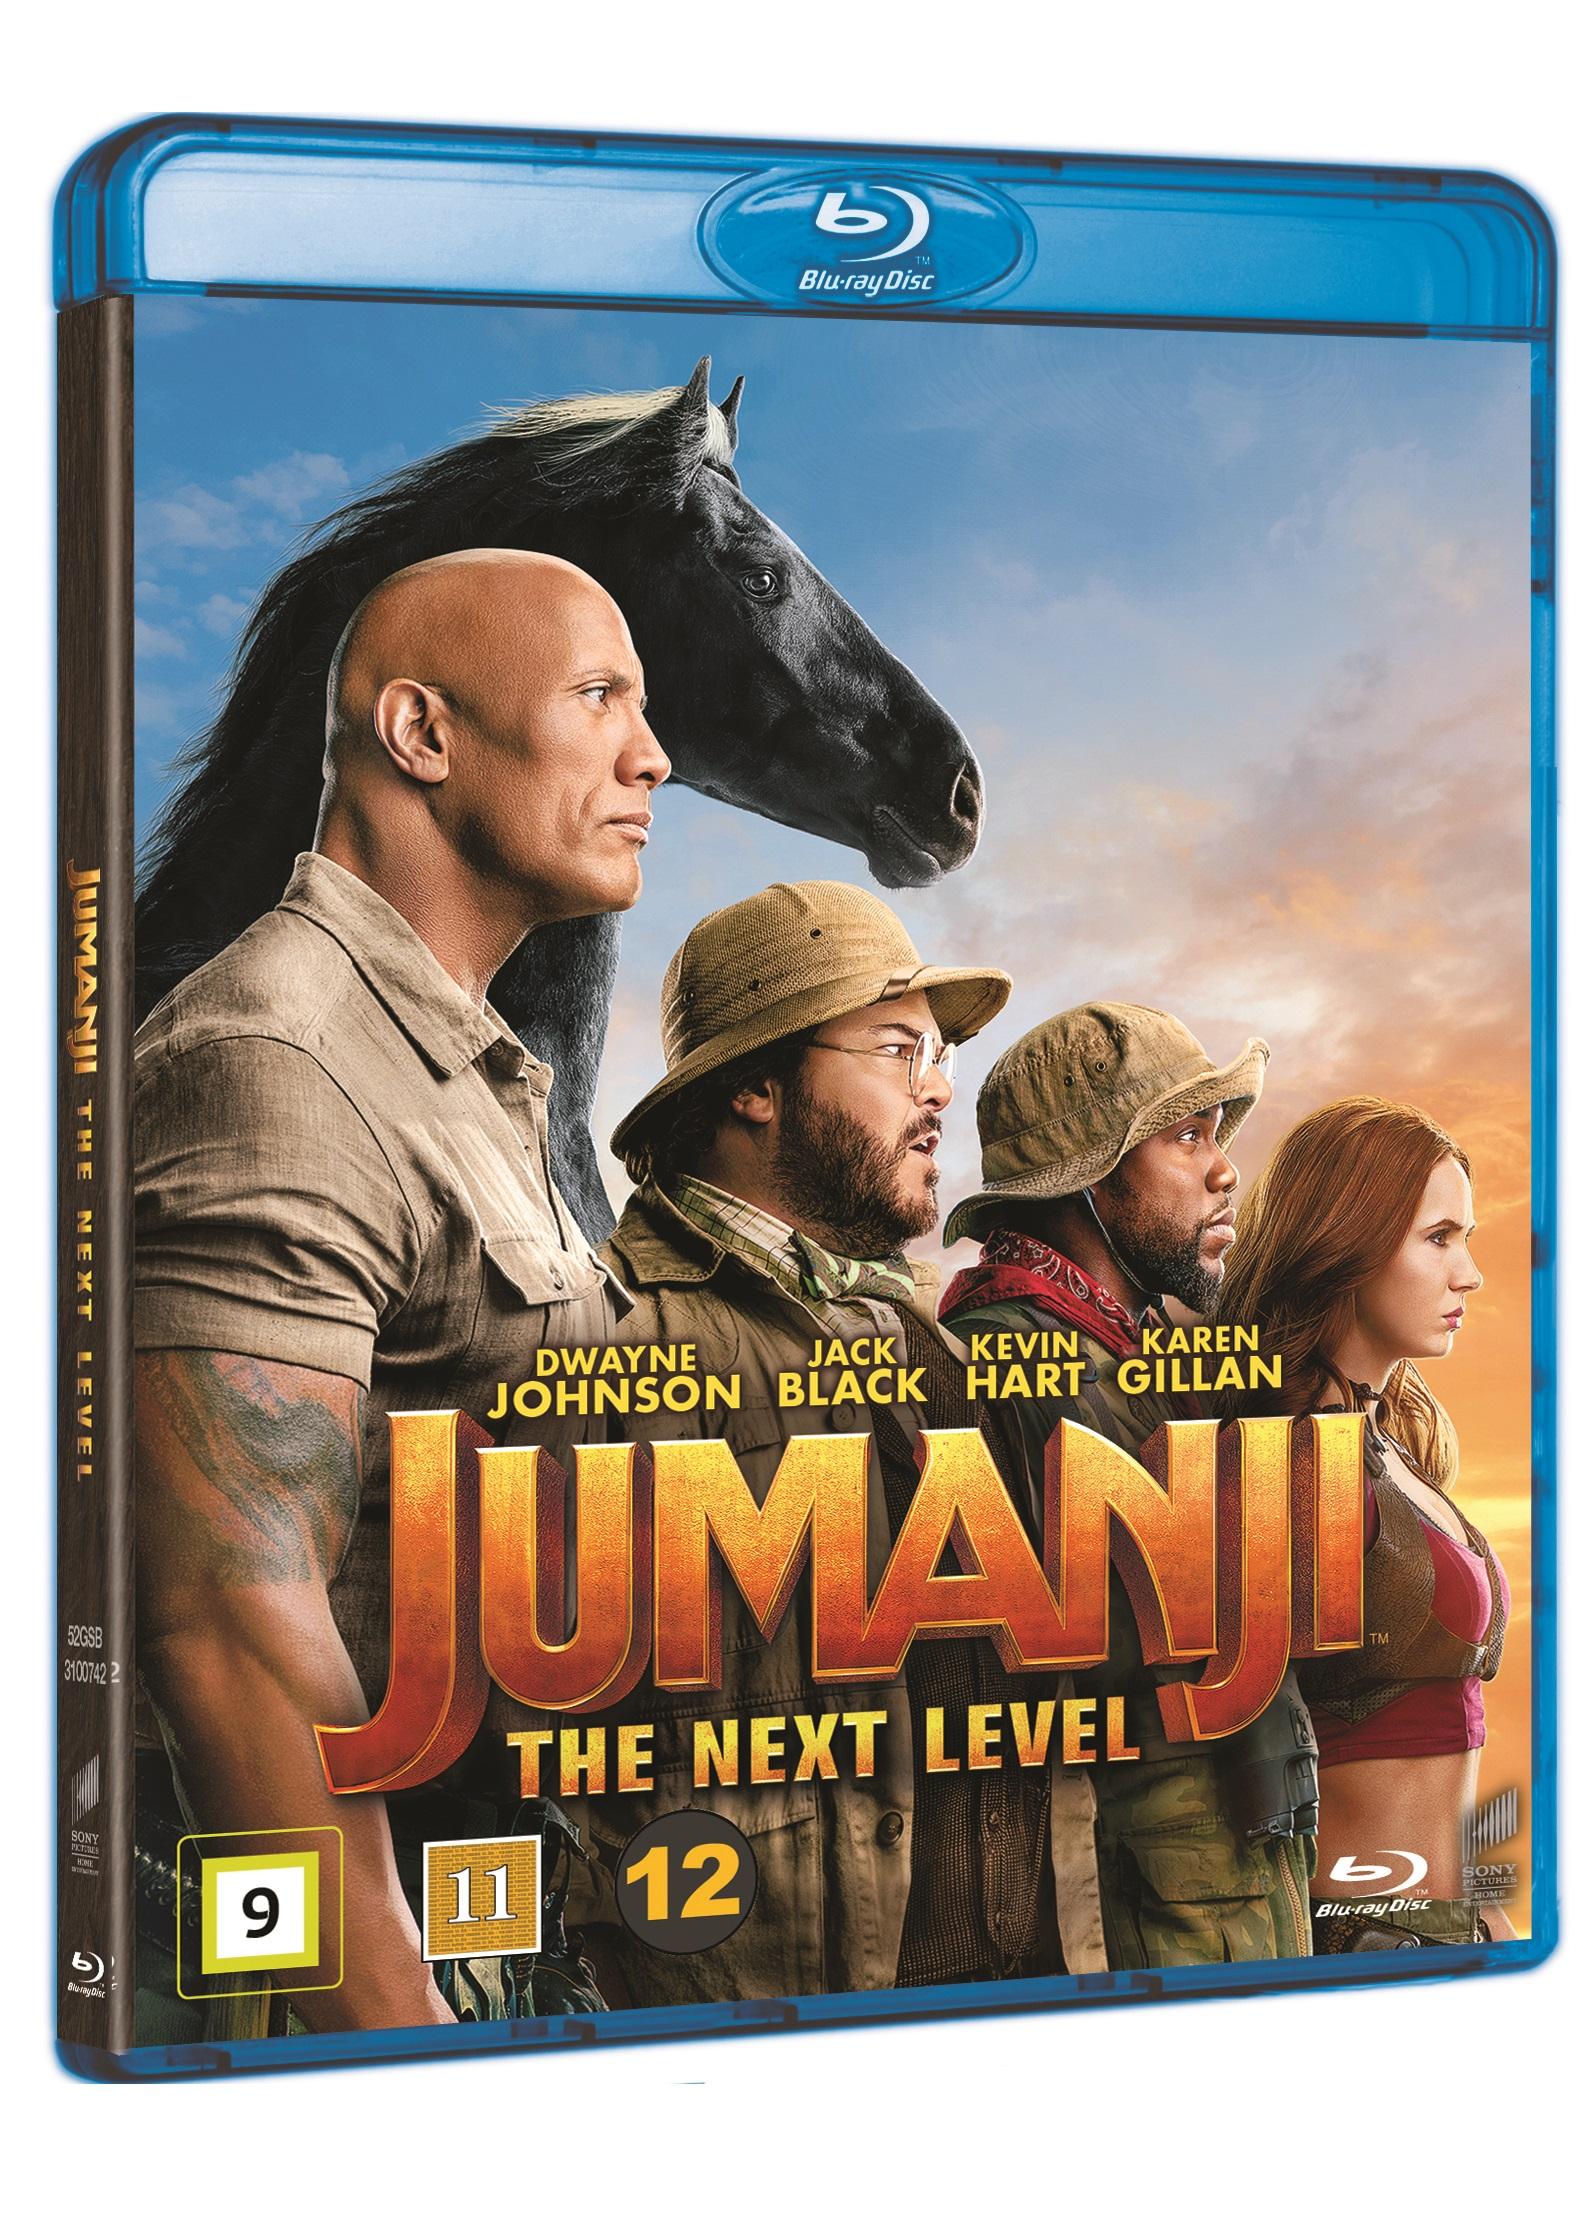 Jumanji: The Next Level -  - Film -  - 7330031007420 - 20/4-2020